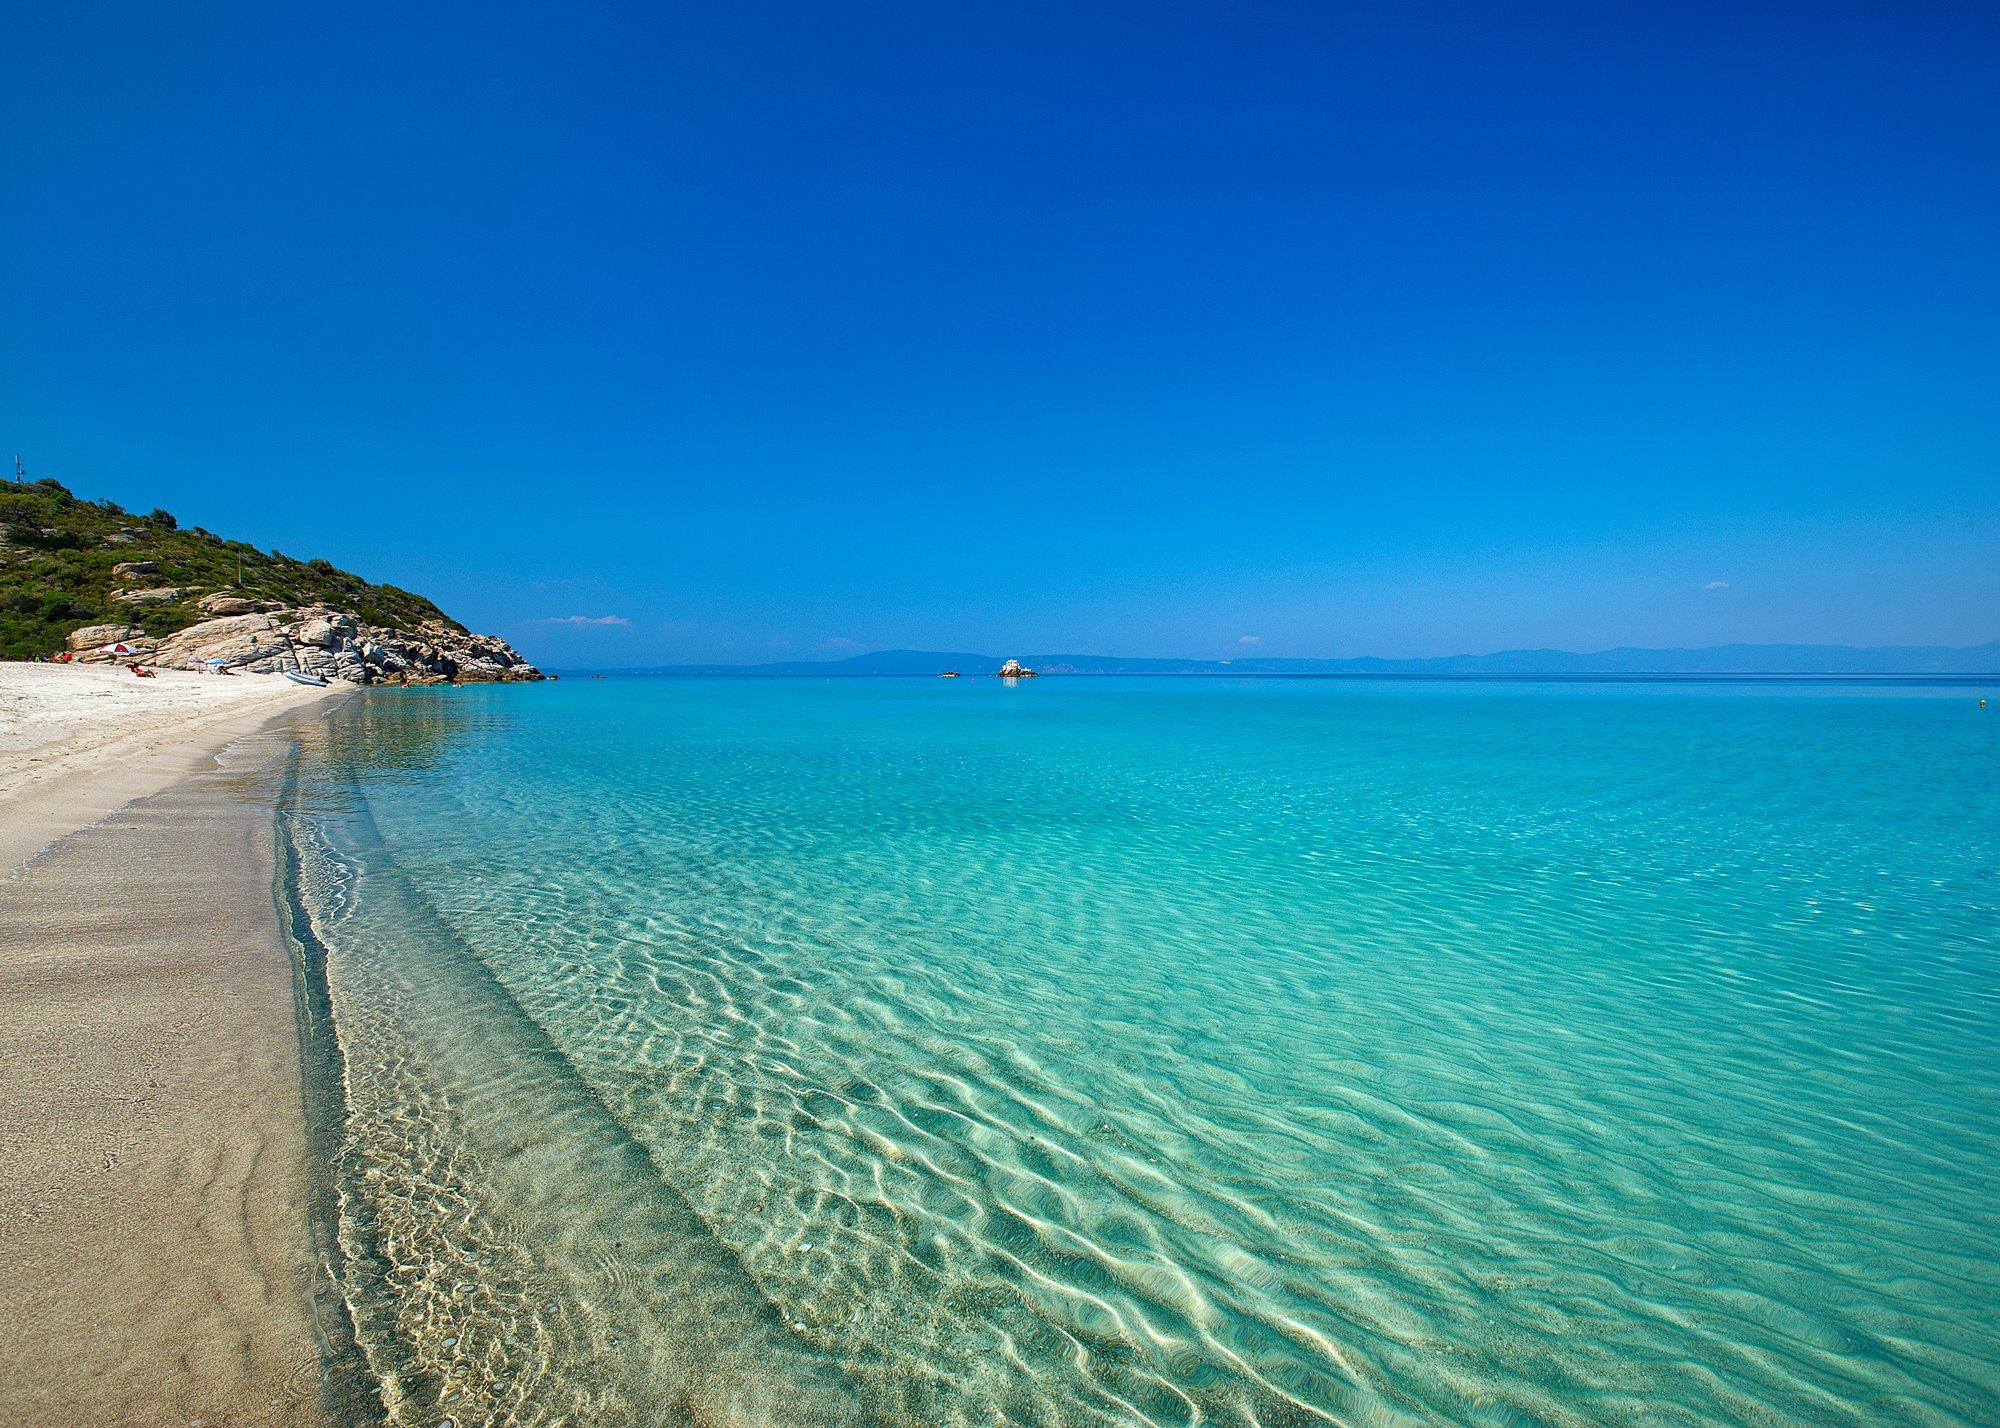 Super Reducere Sejur Grecia - Thassos Hotel 3 * Iunie - August 7 nopti de la doar 399 Euro/persoana!